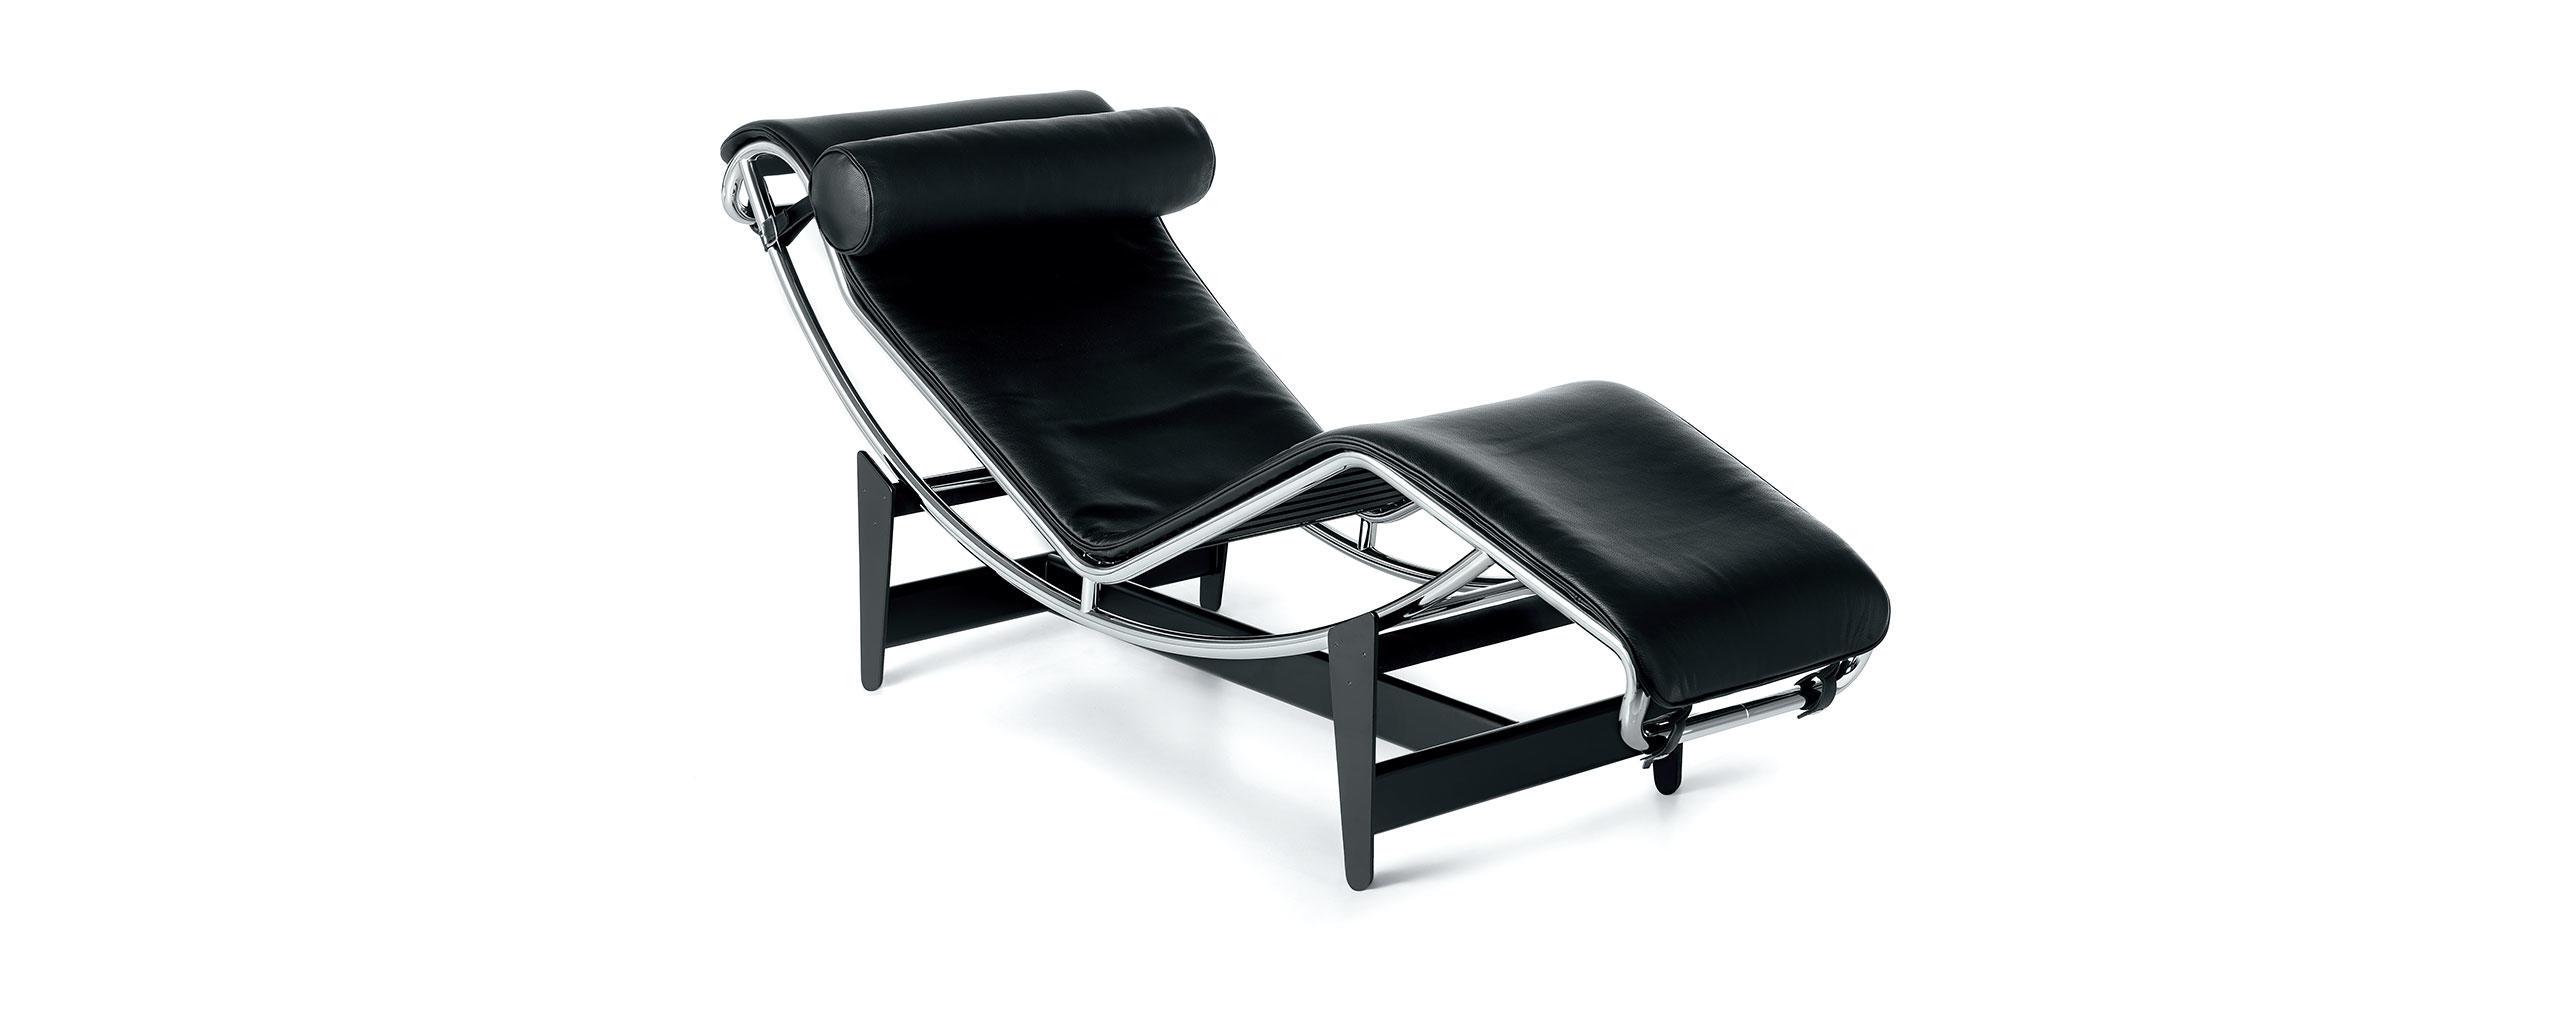 squarcina cassina lc4 squarcina. Black Bedroom Furniture Sets. Home Design Ideas